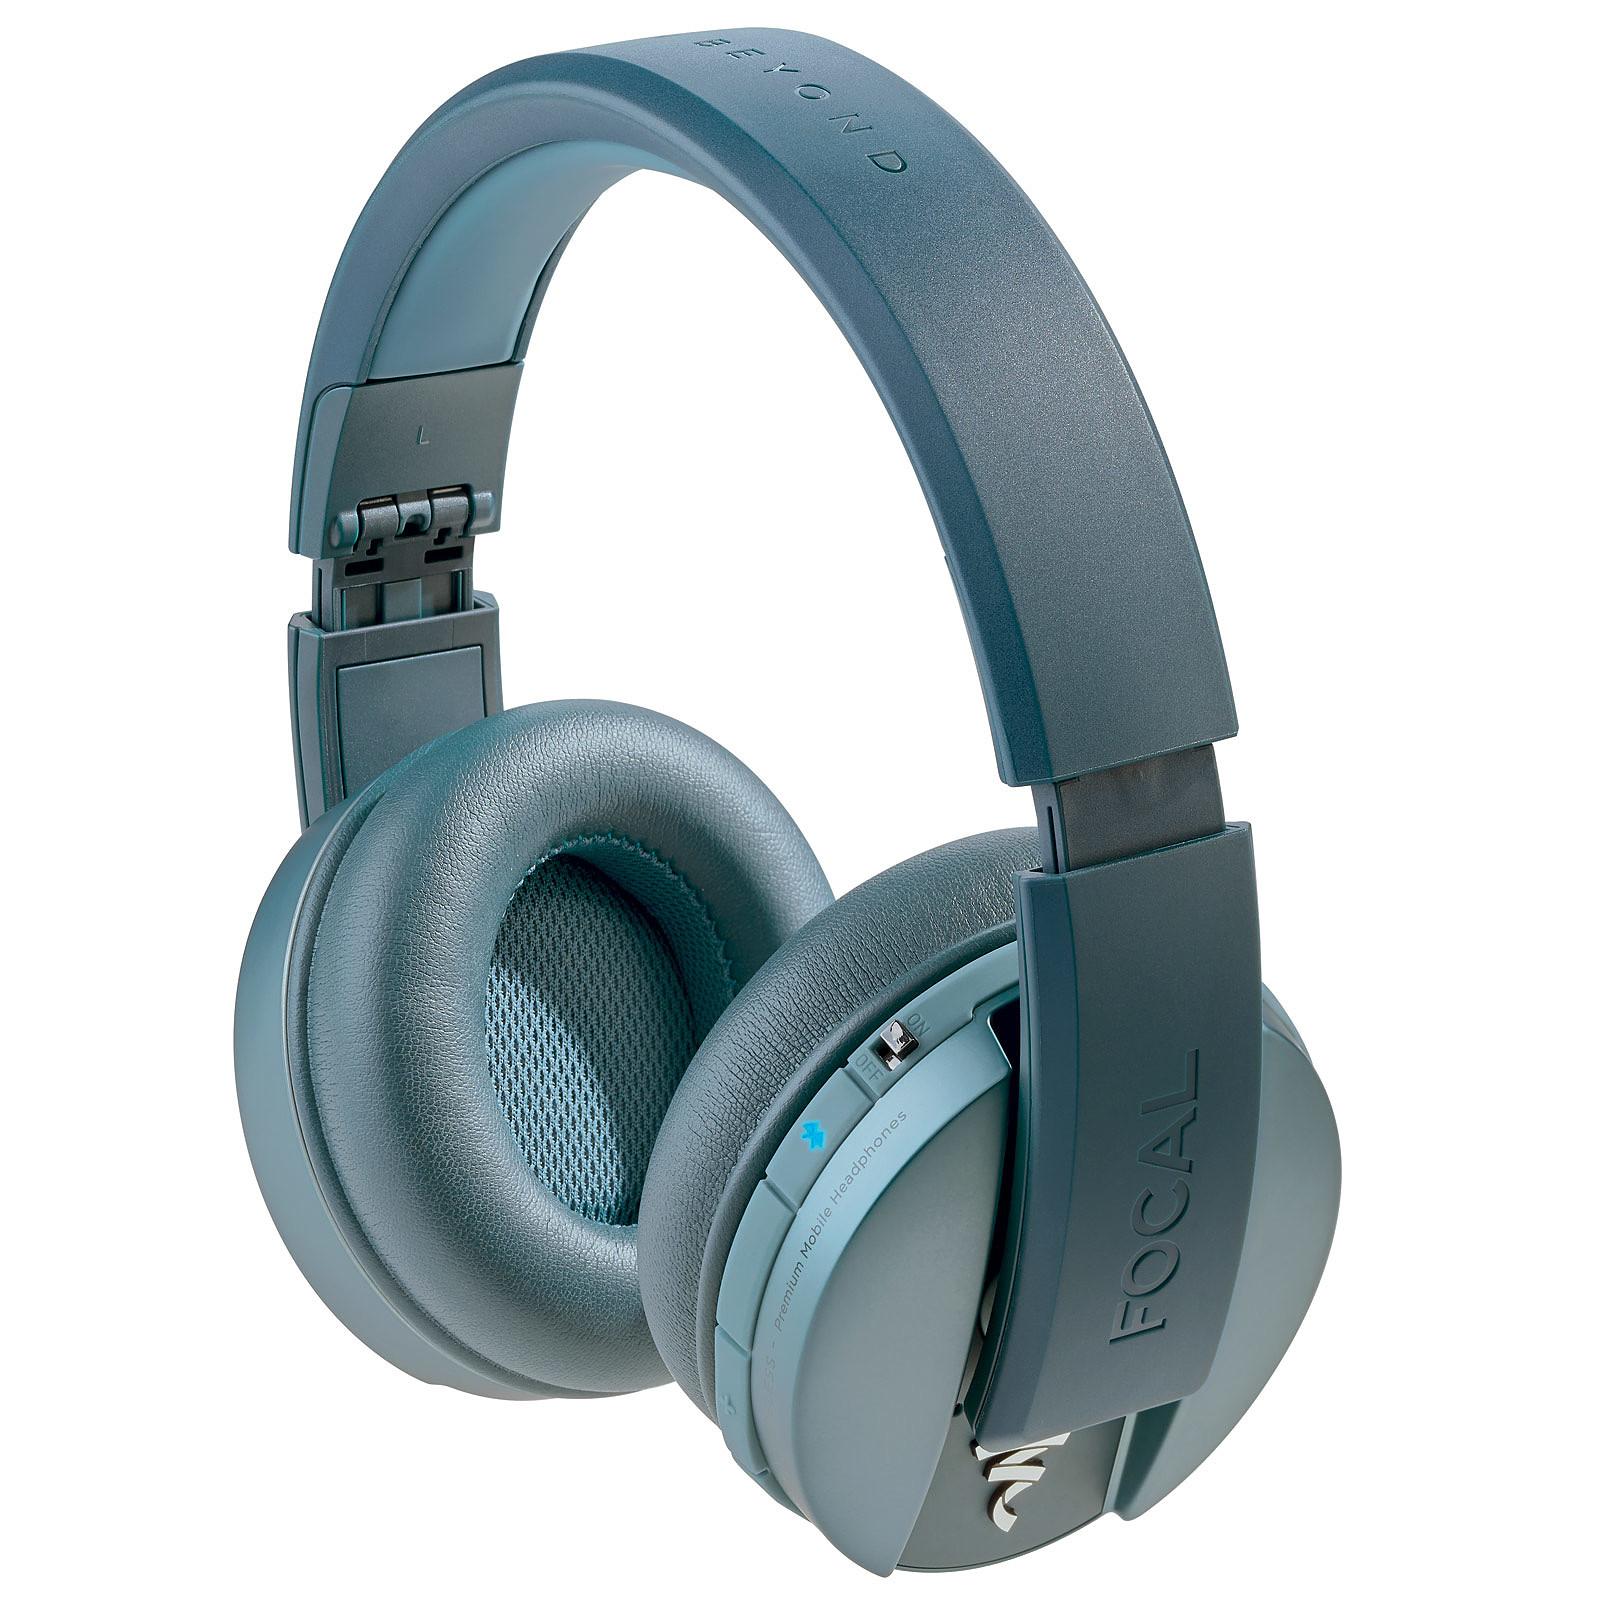 Focal Listen Wireless Chic Blue